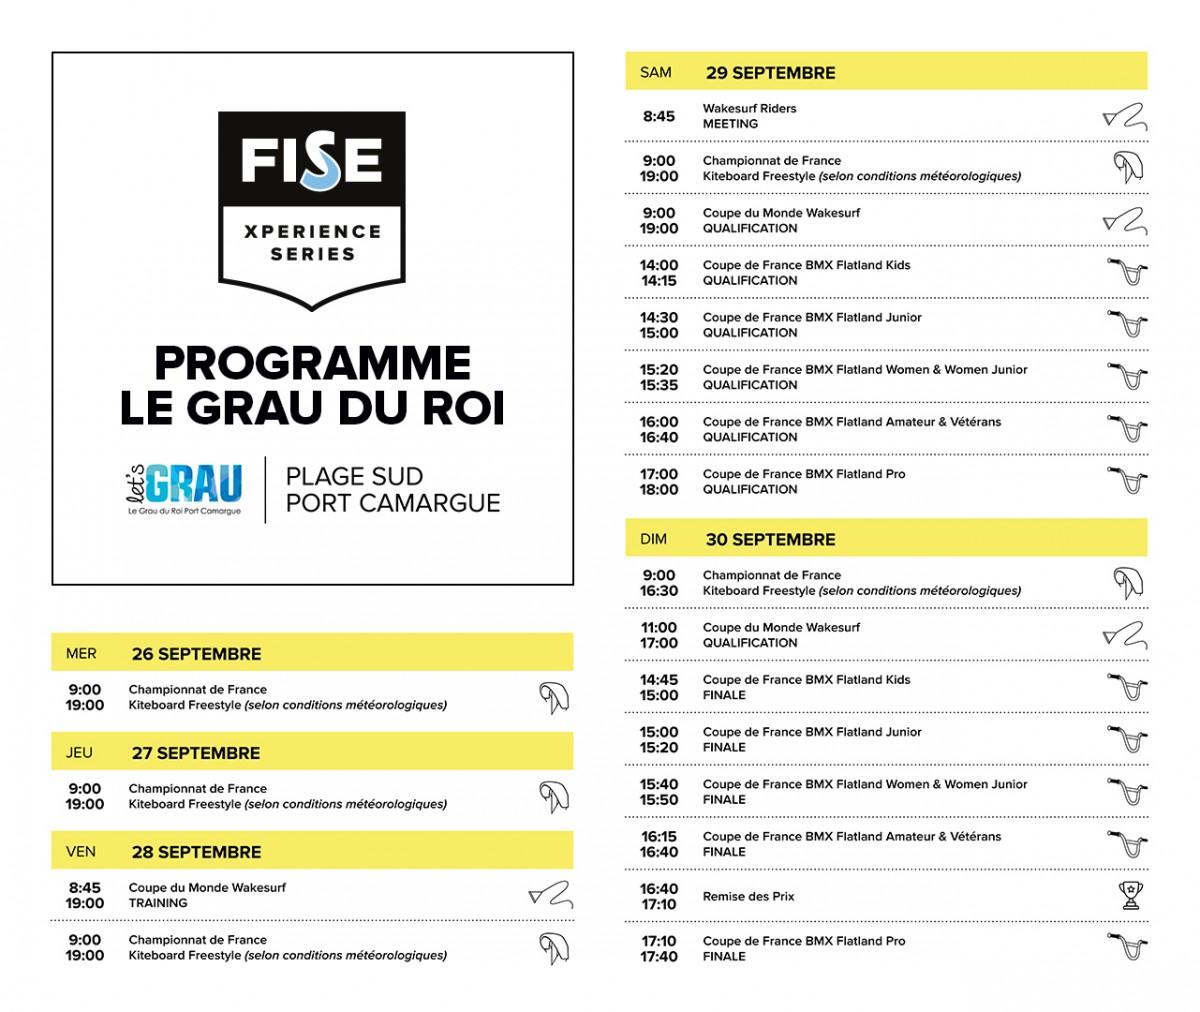 Programme du FISE Xperience Grau du Roi 2018